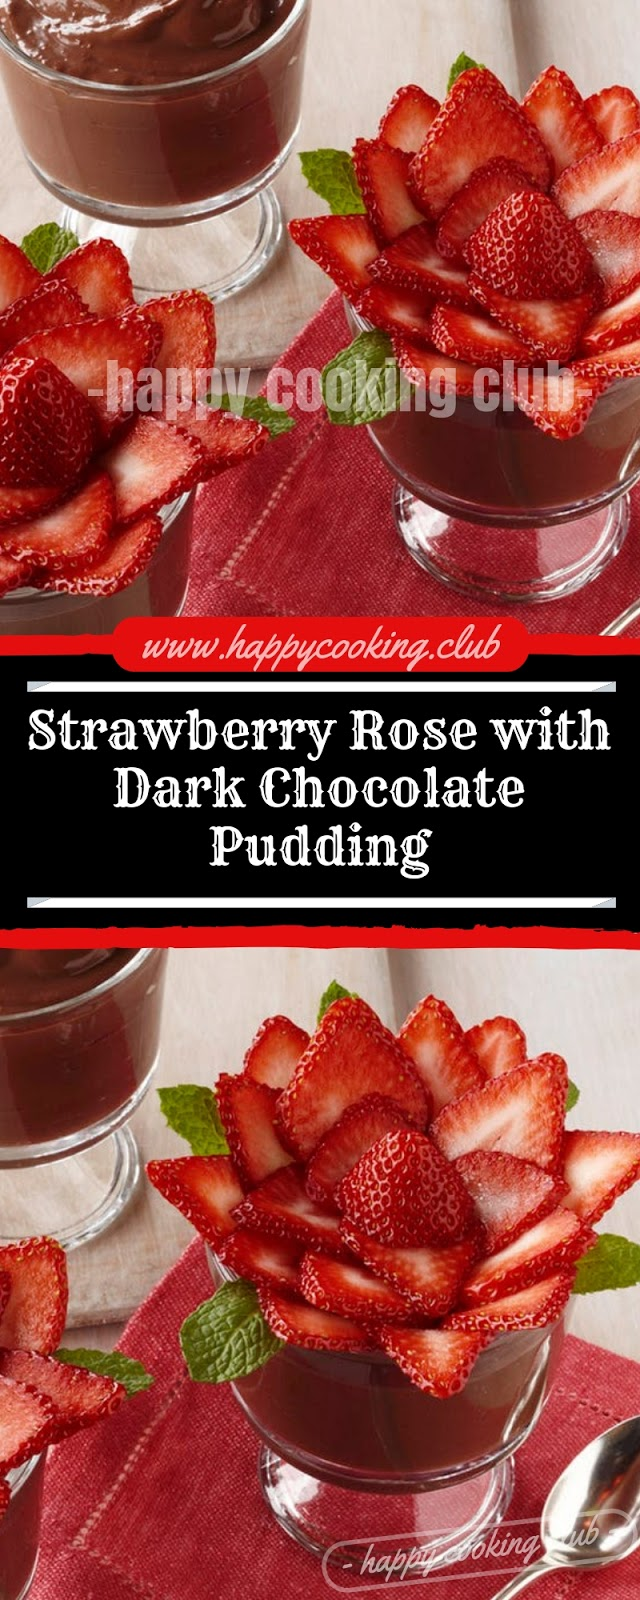 Strawberry Rose with Dark Chocolate Pudding